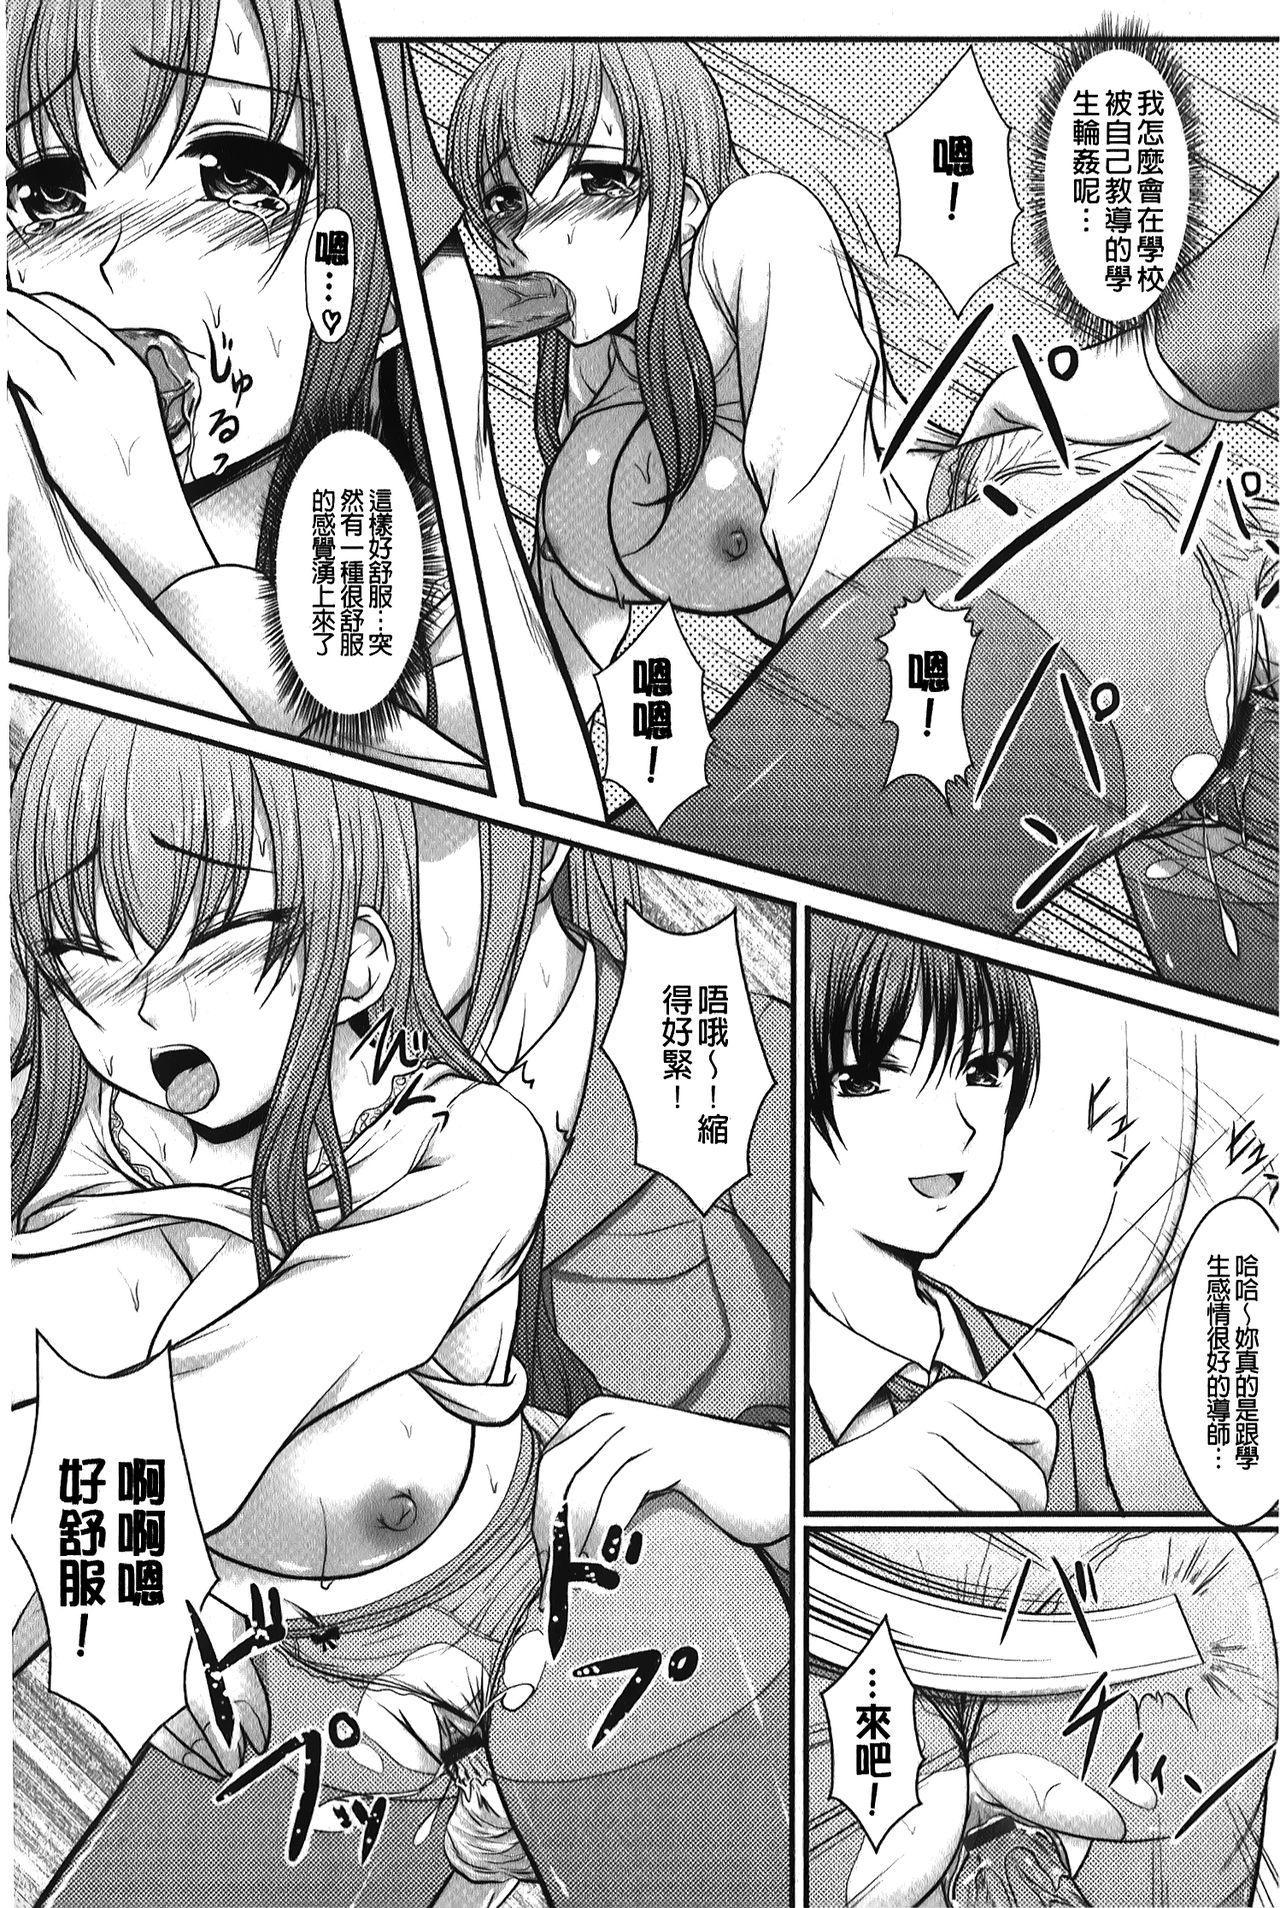 Hameochi | 戳插墮落 160